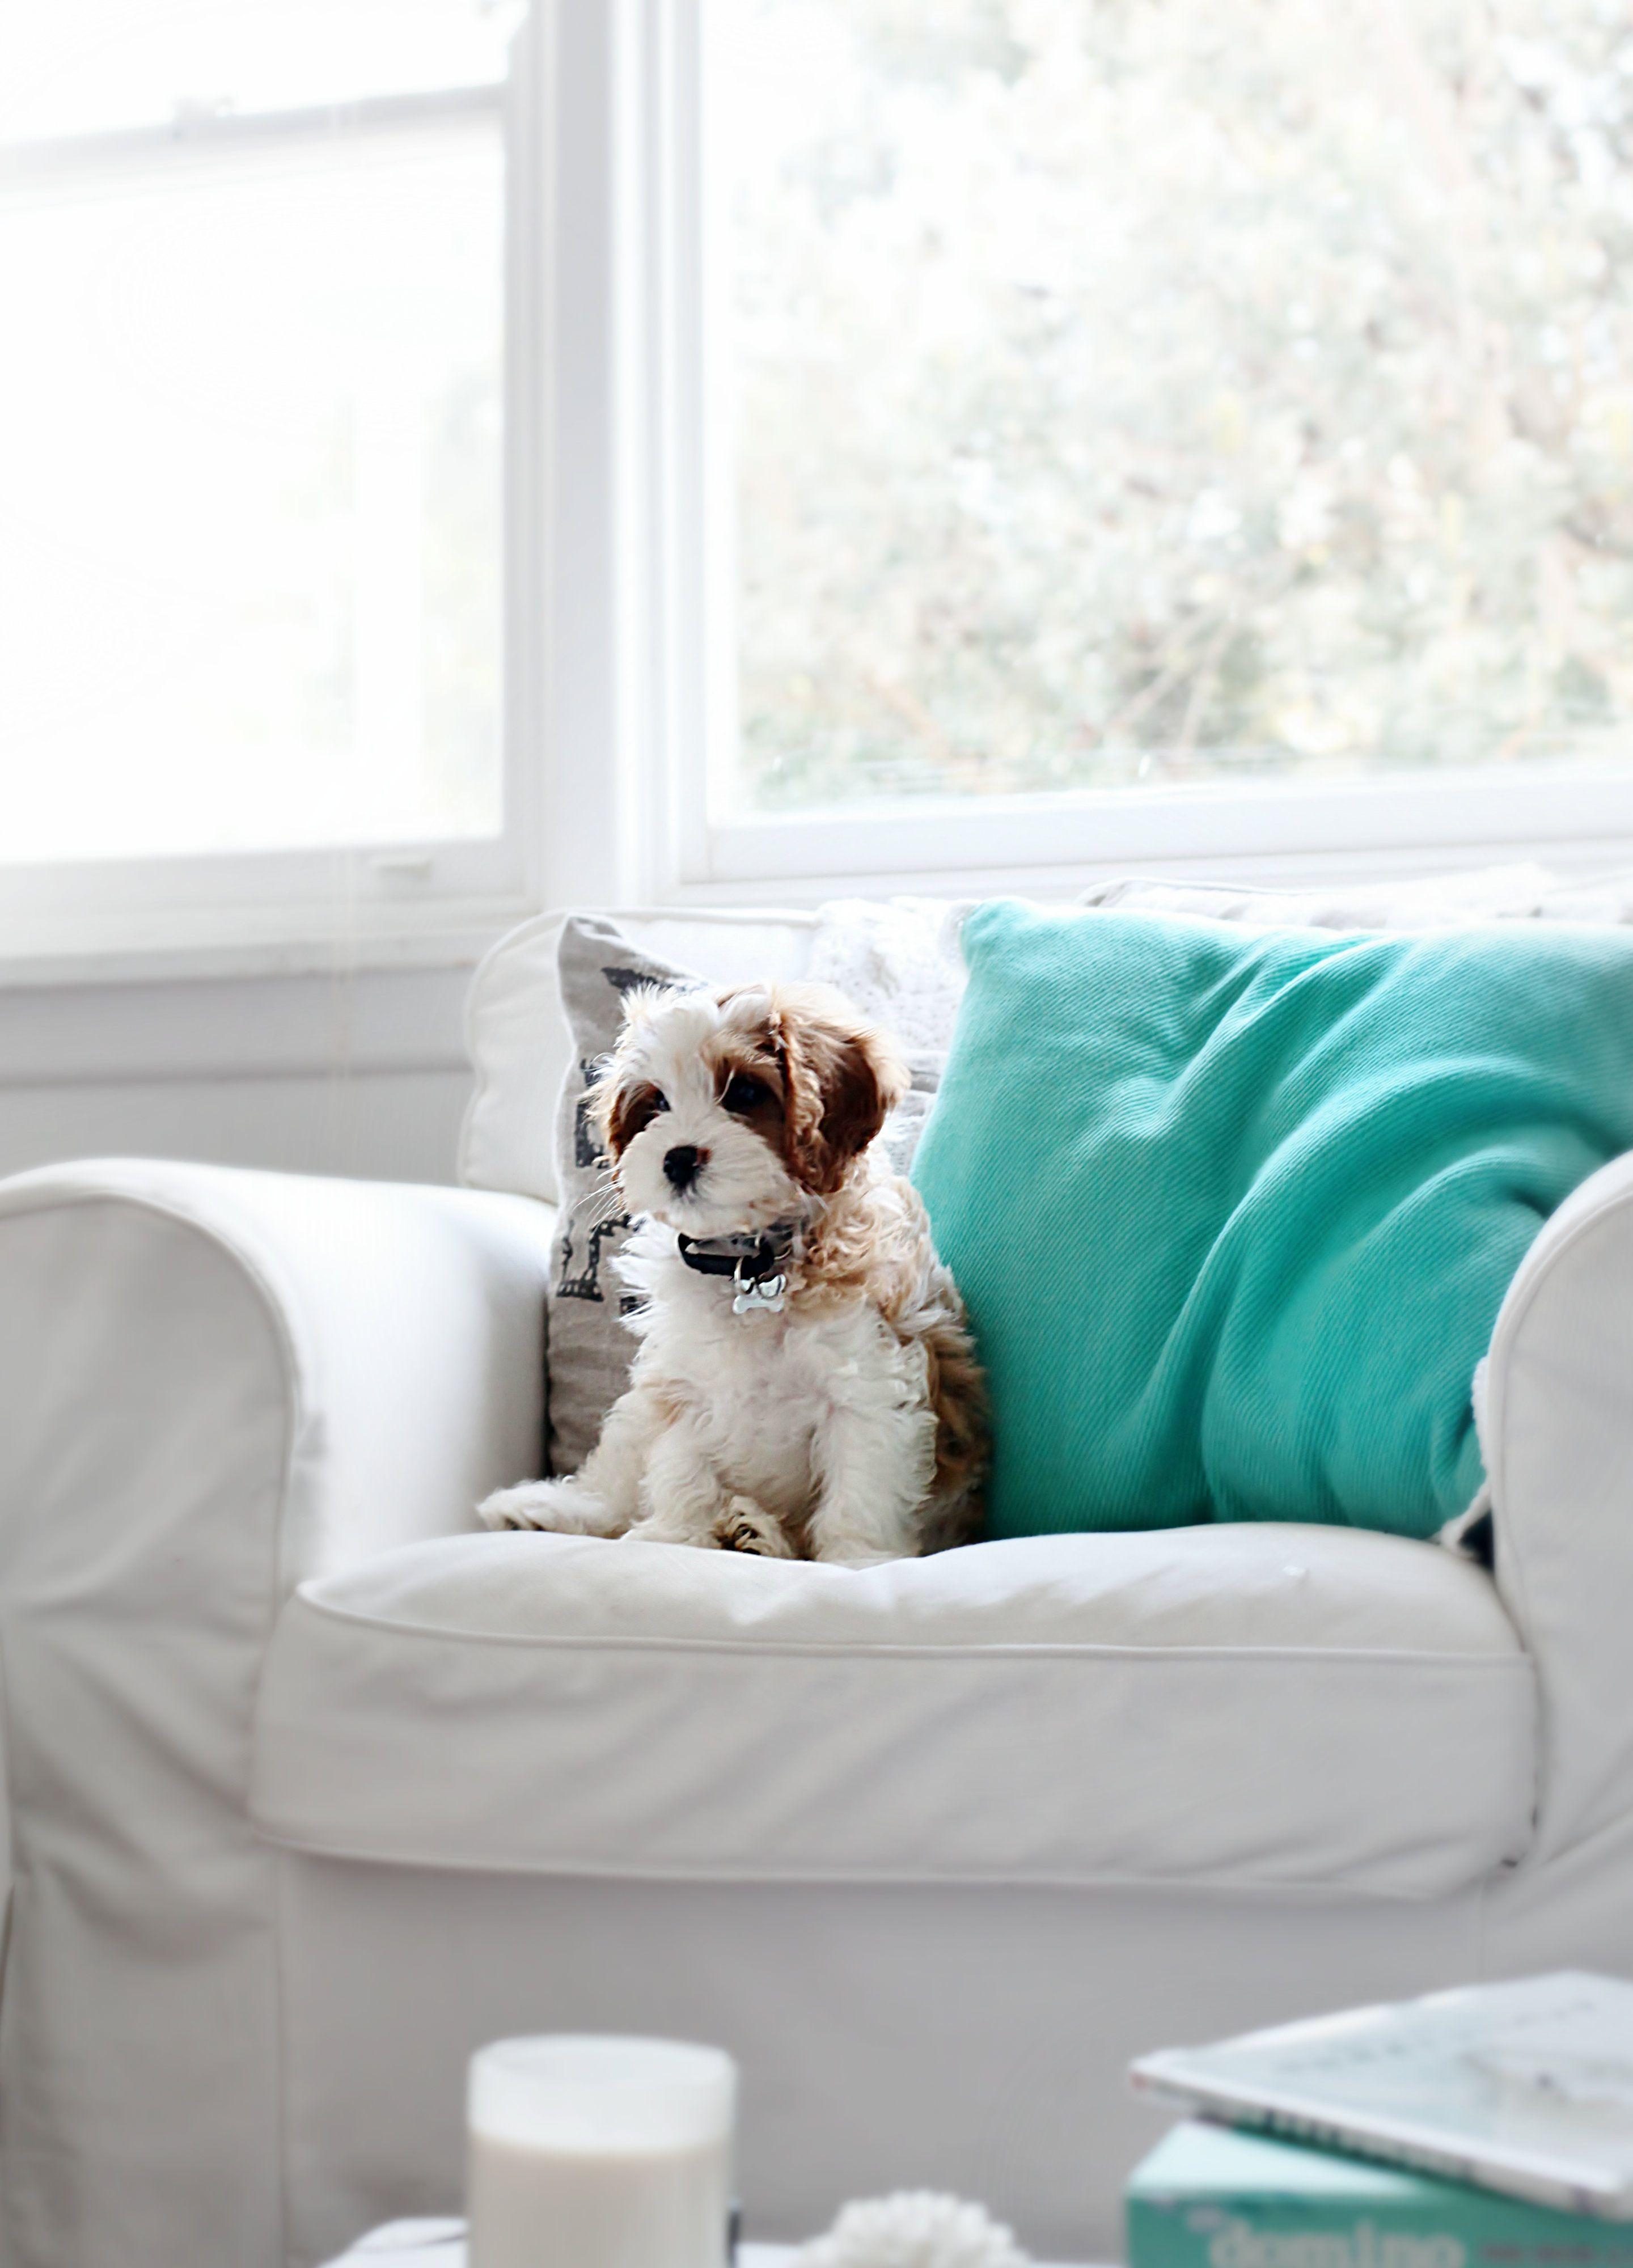 Cavoodle puppy doodle dog and poodle mix